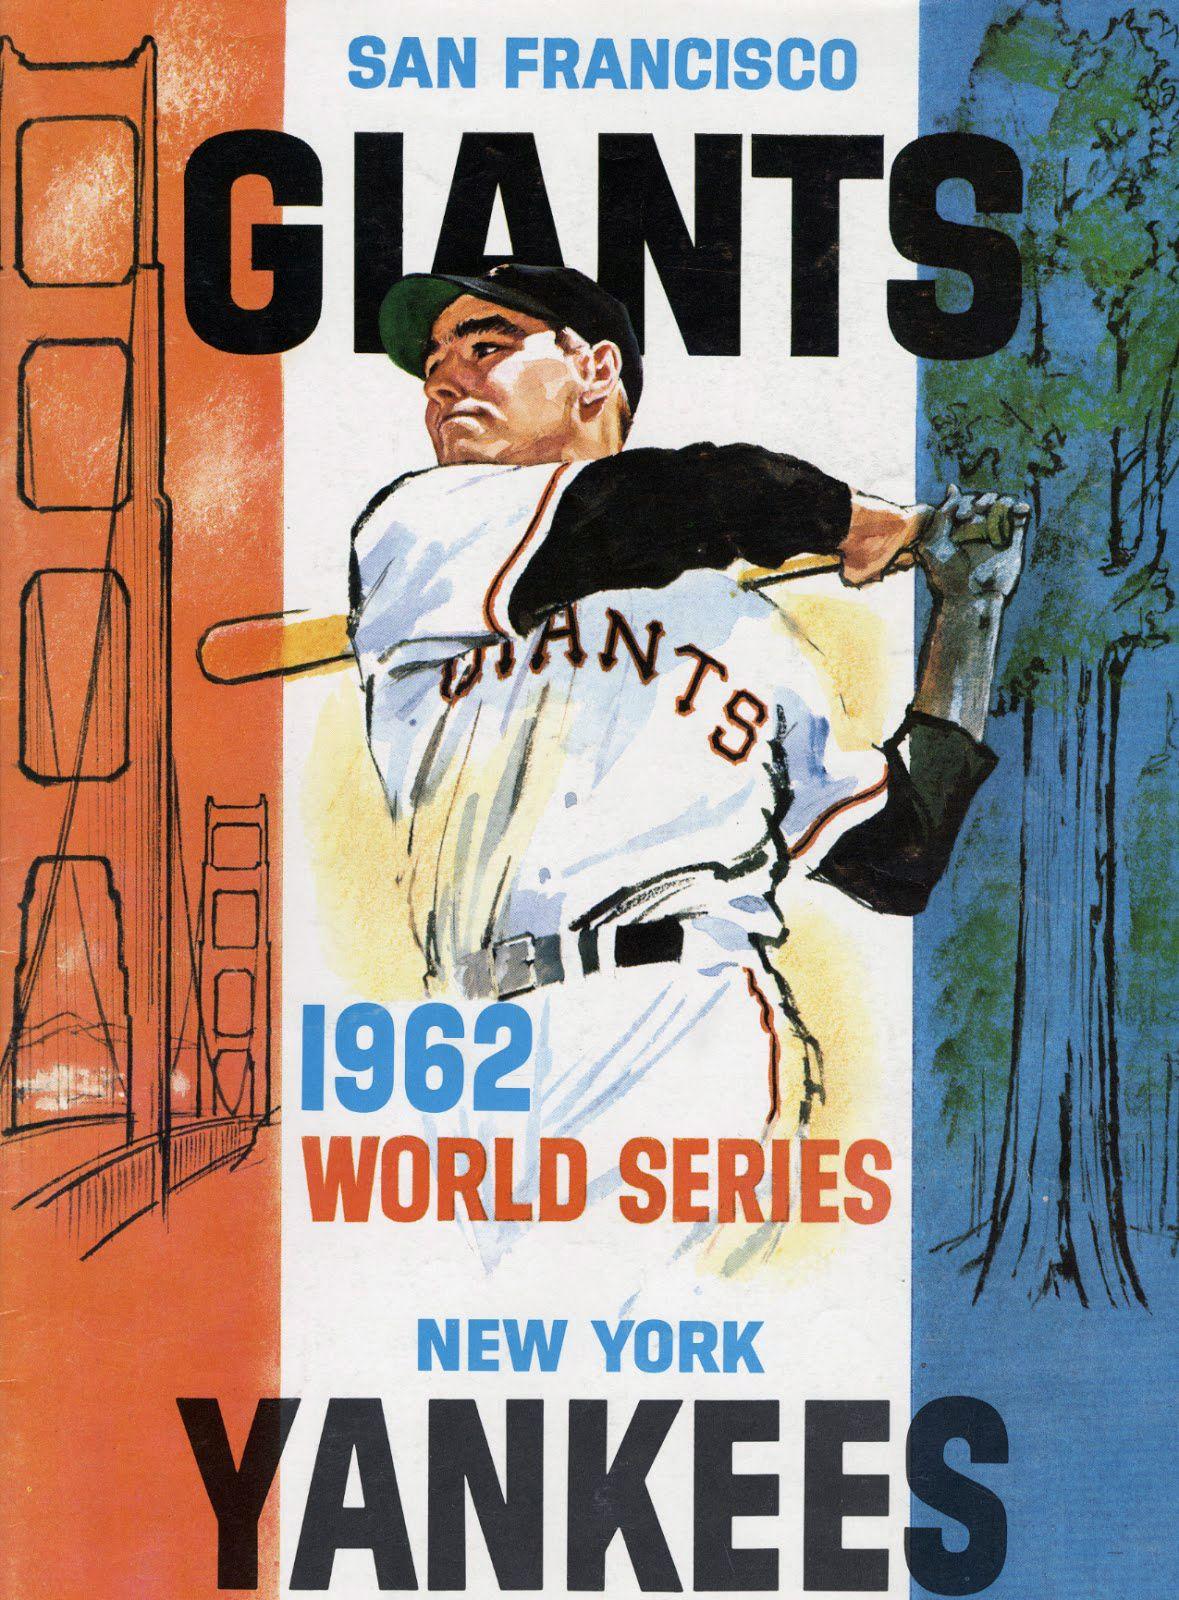 1962 World Series Program